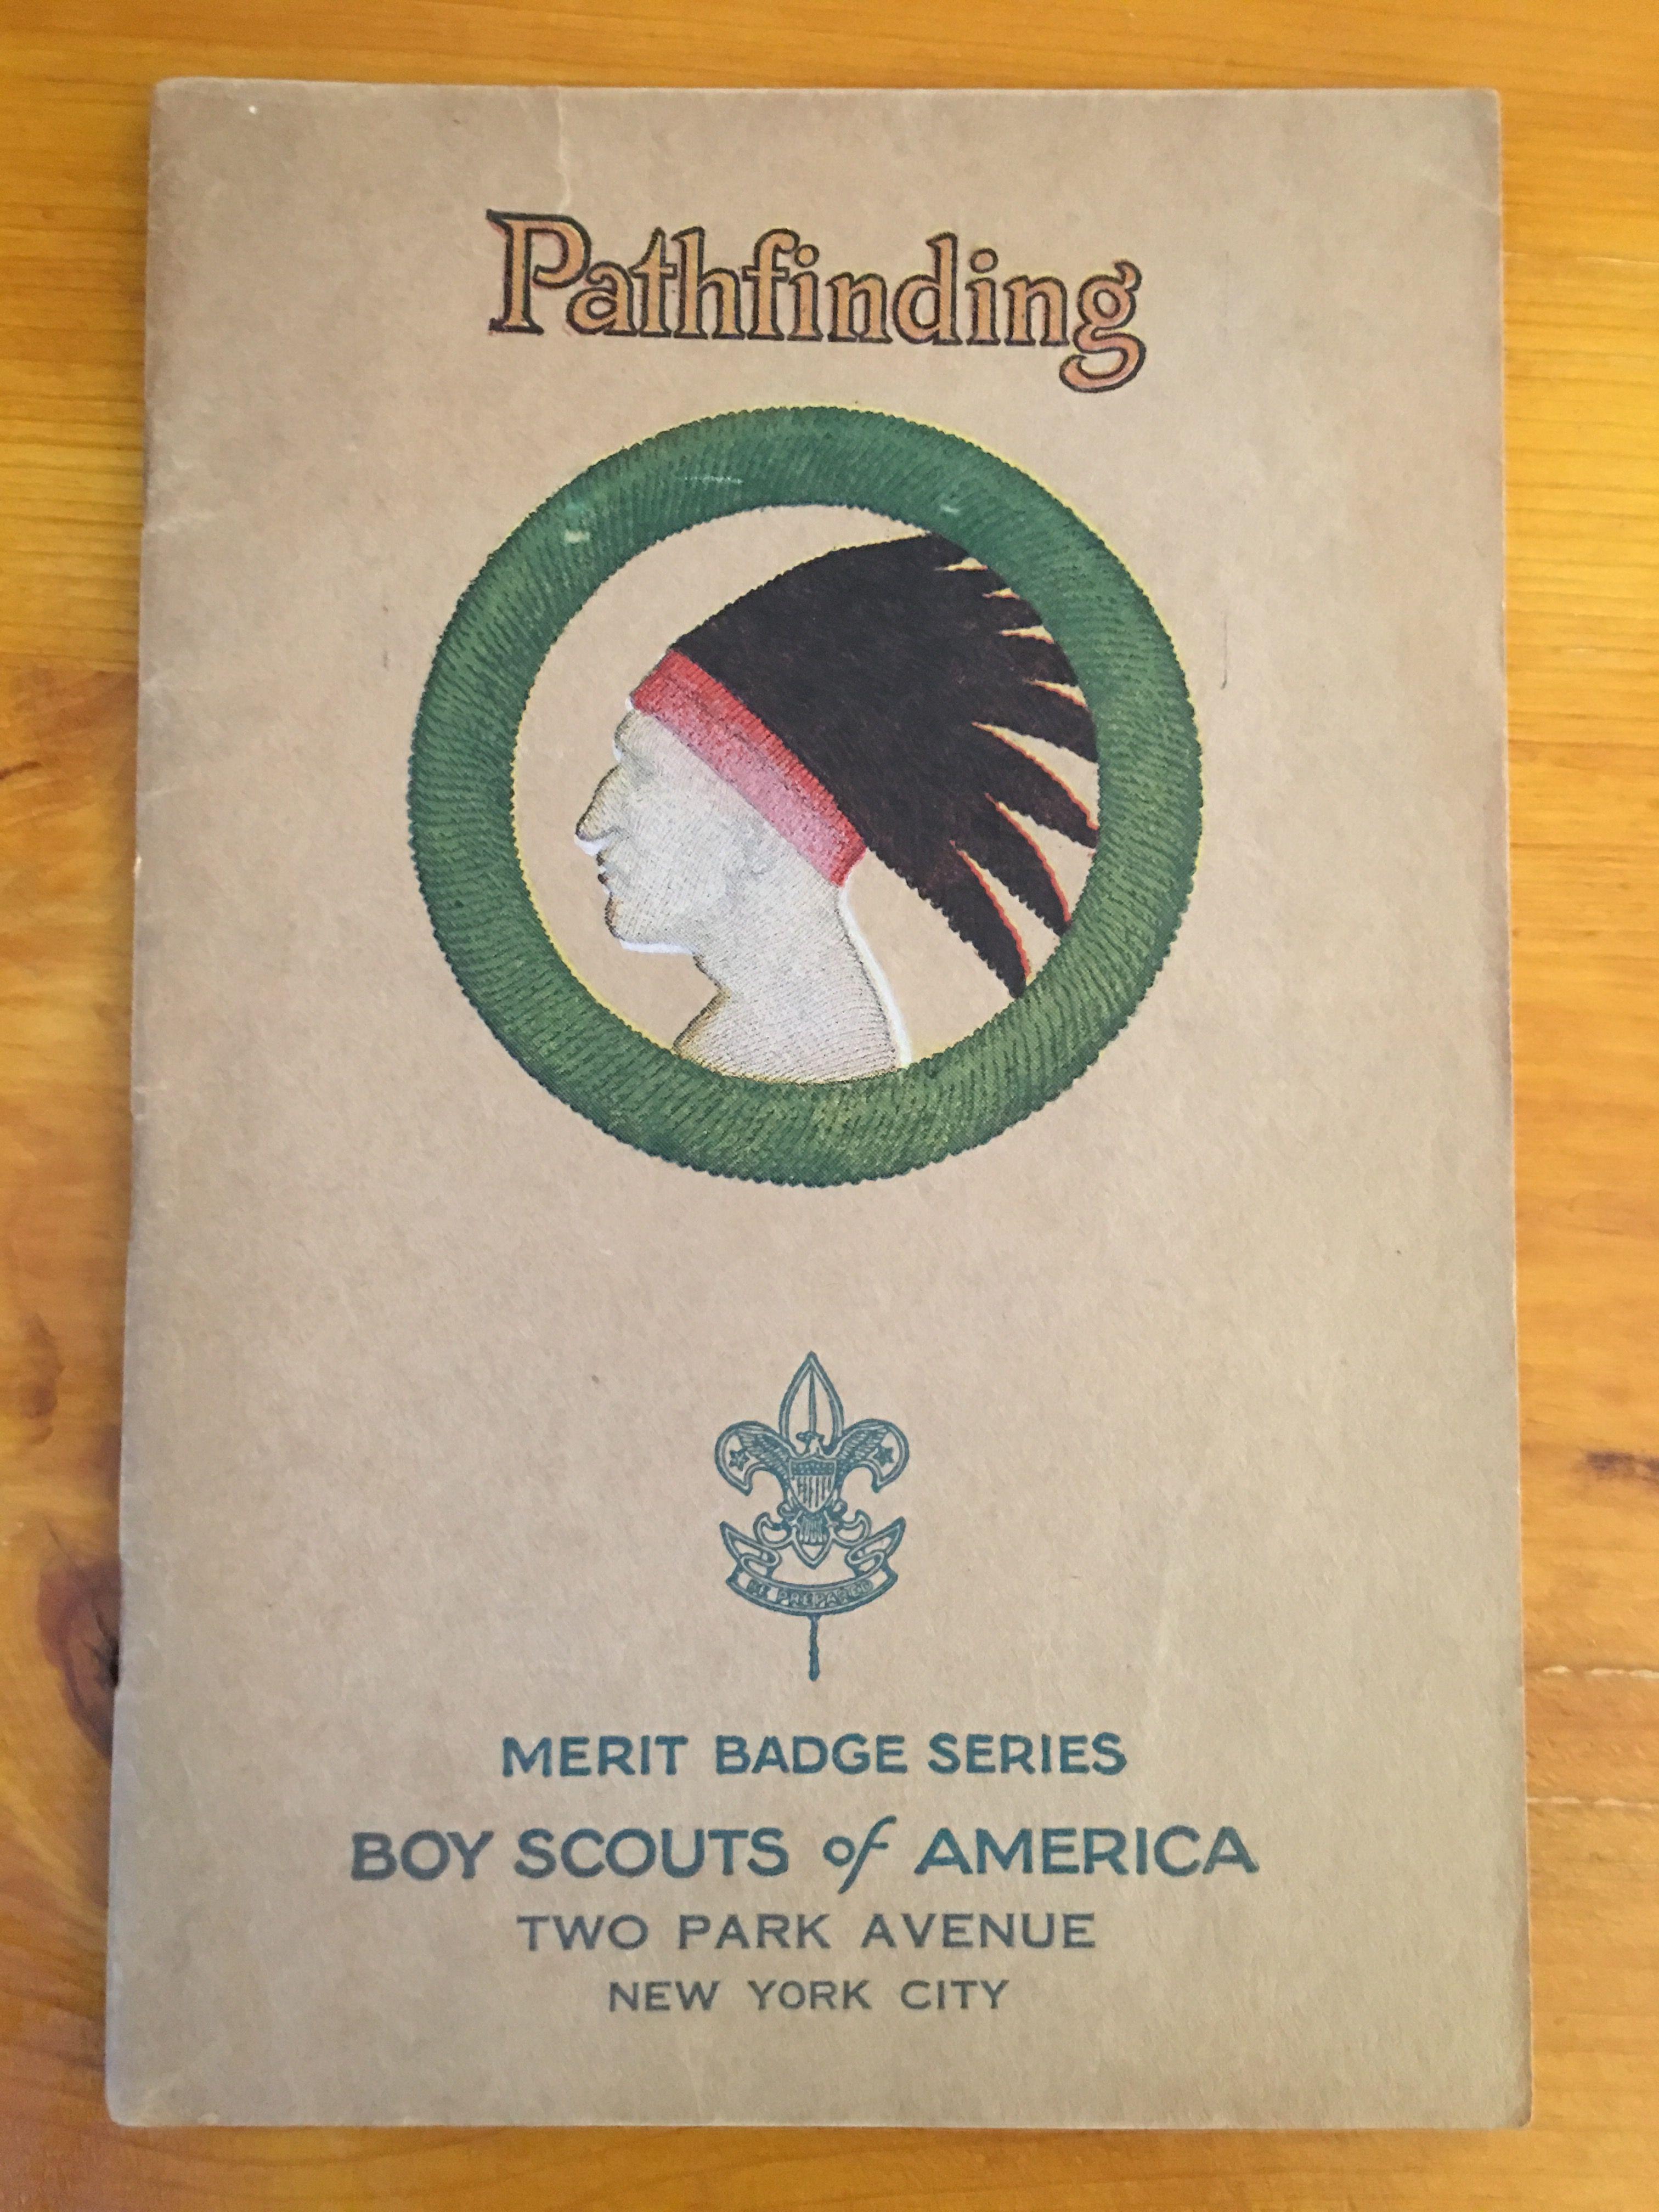 Pathfinding Merit Badge Book